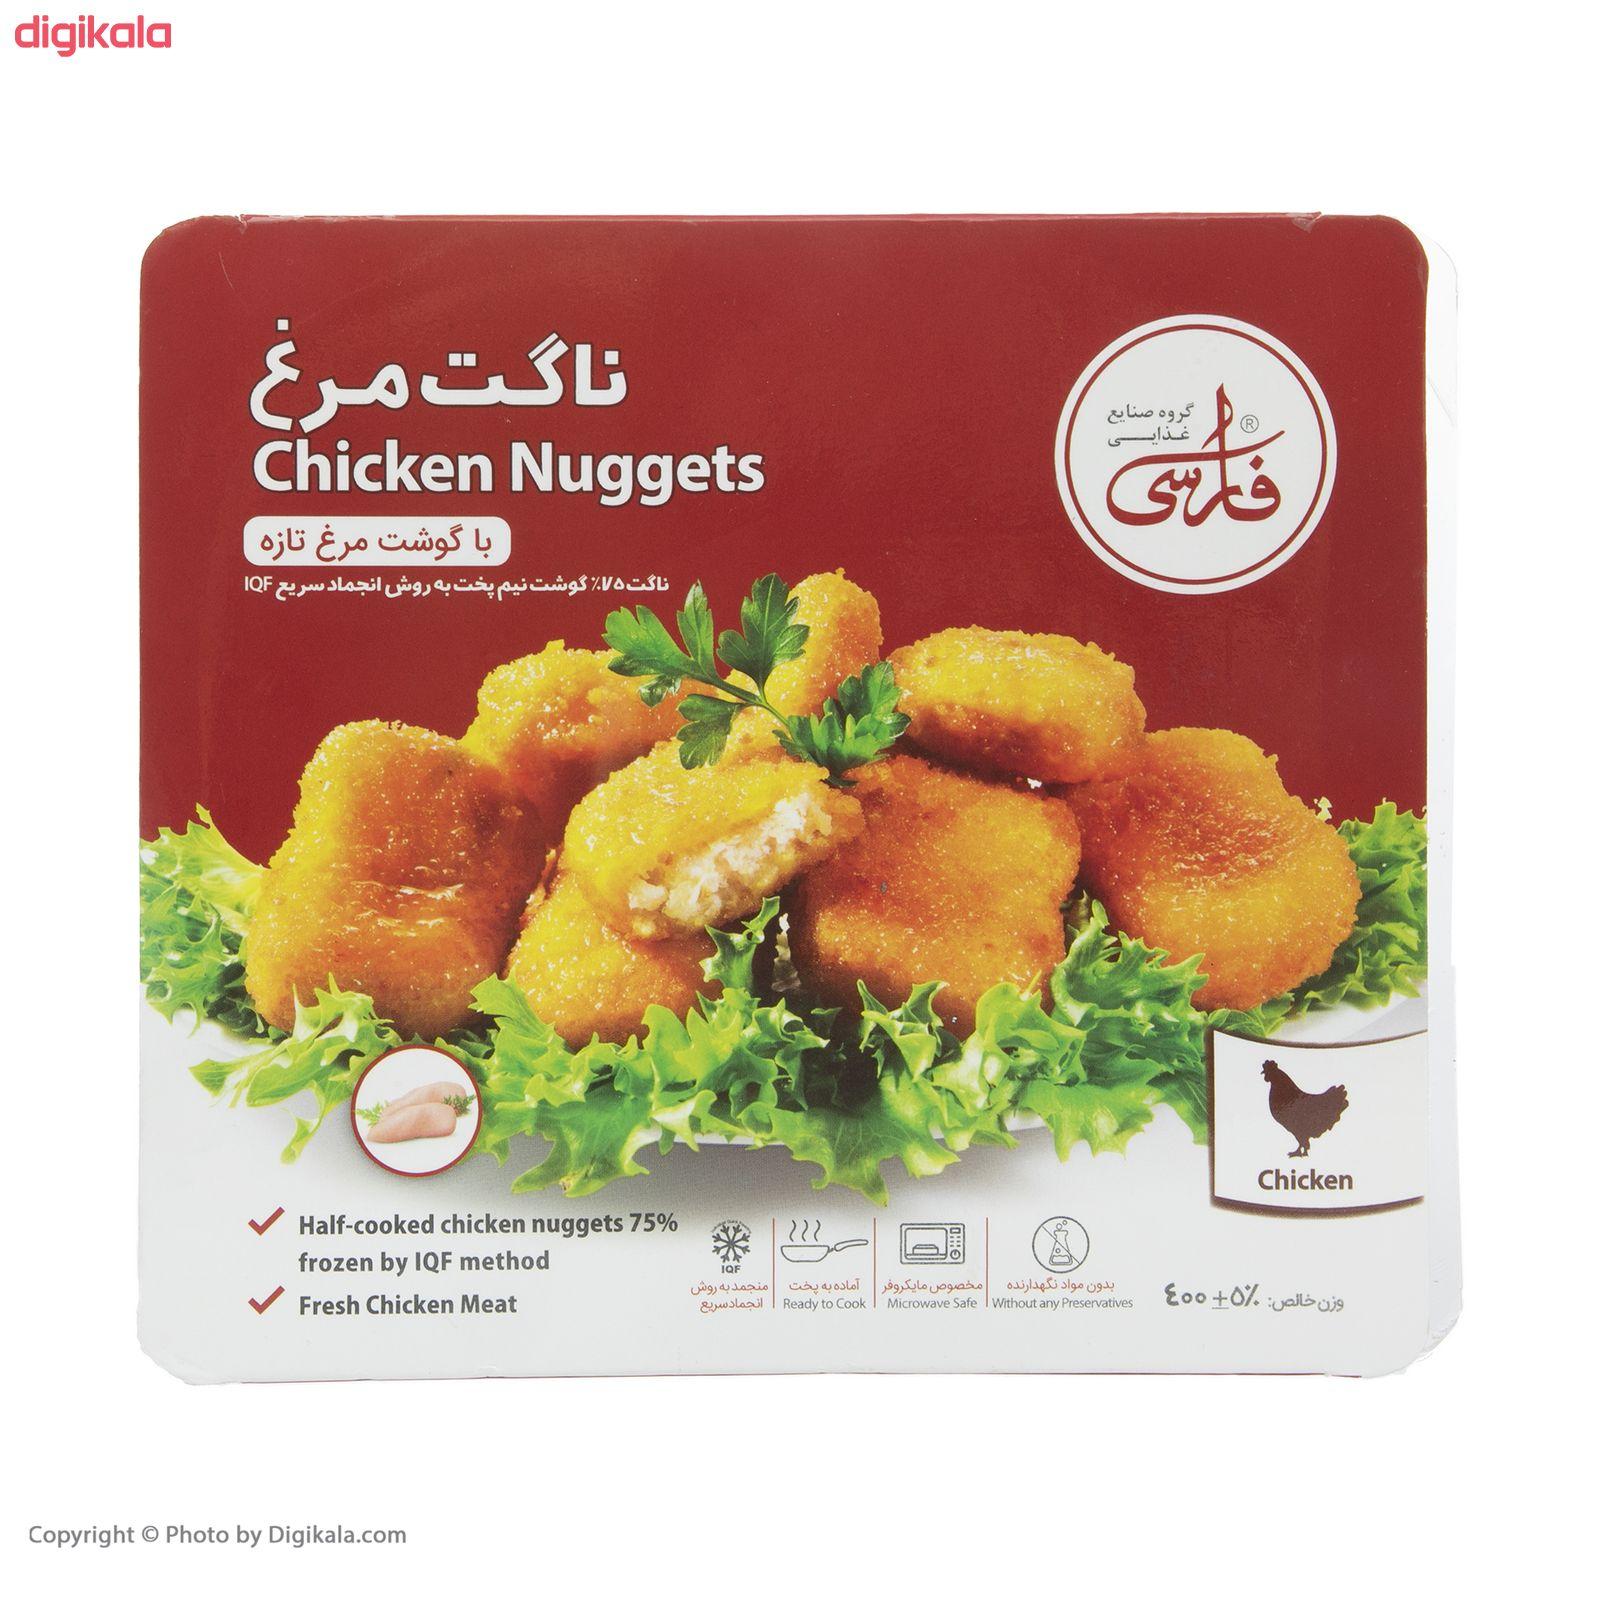 ناگت مرغ فارسی - 400 گرم main 1 3